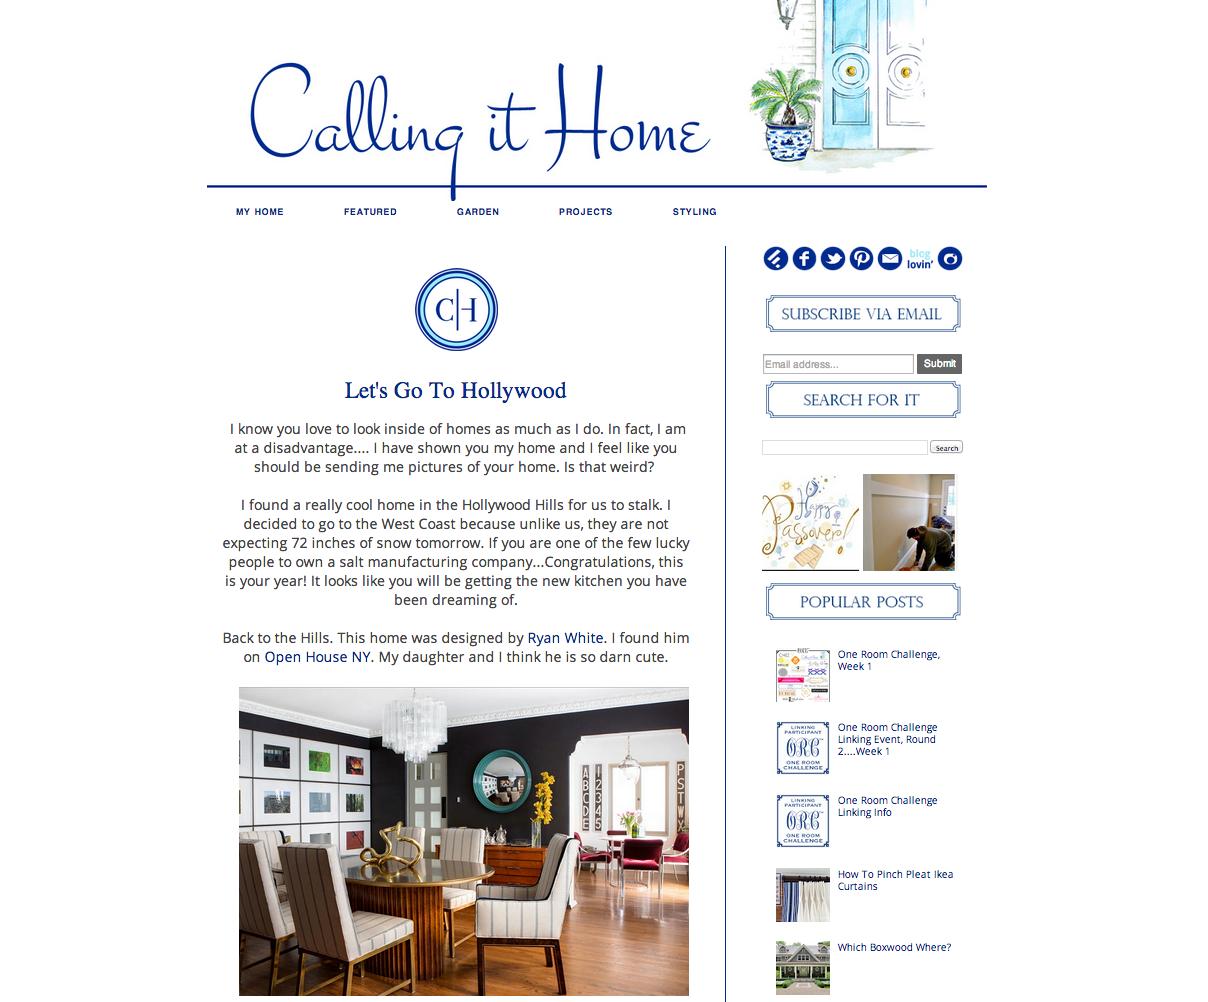 Calling It Home: Ryan White